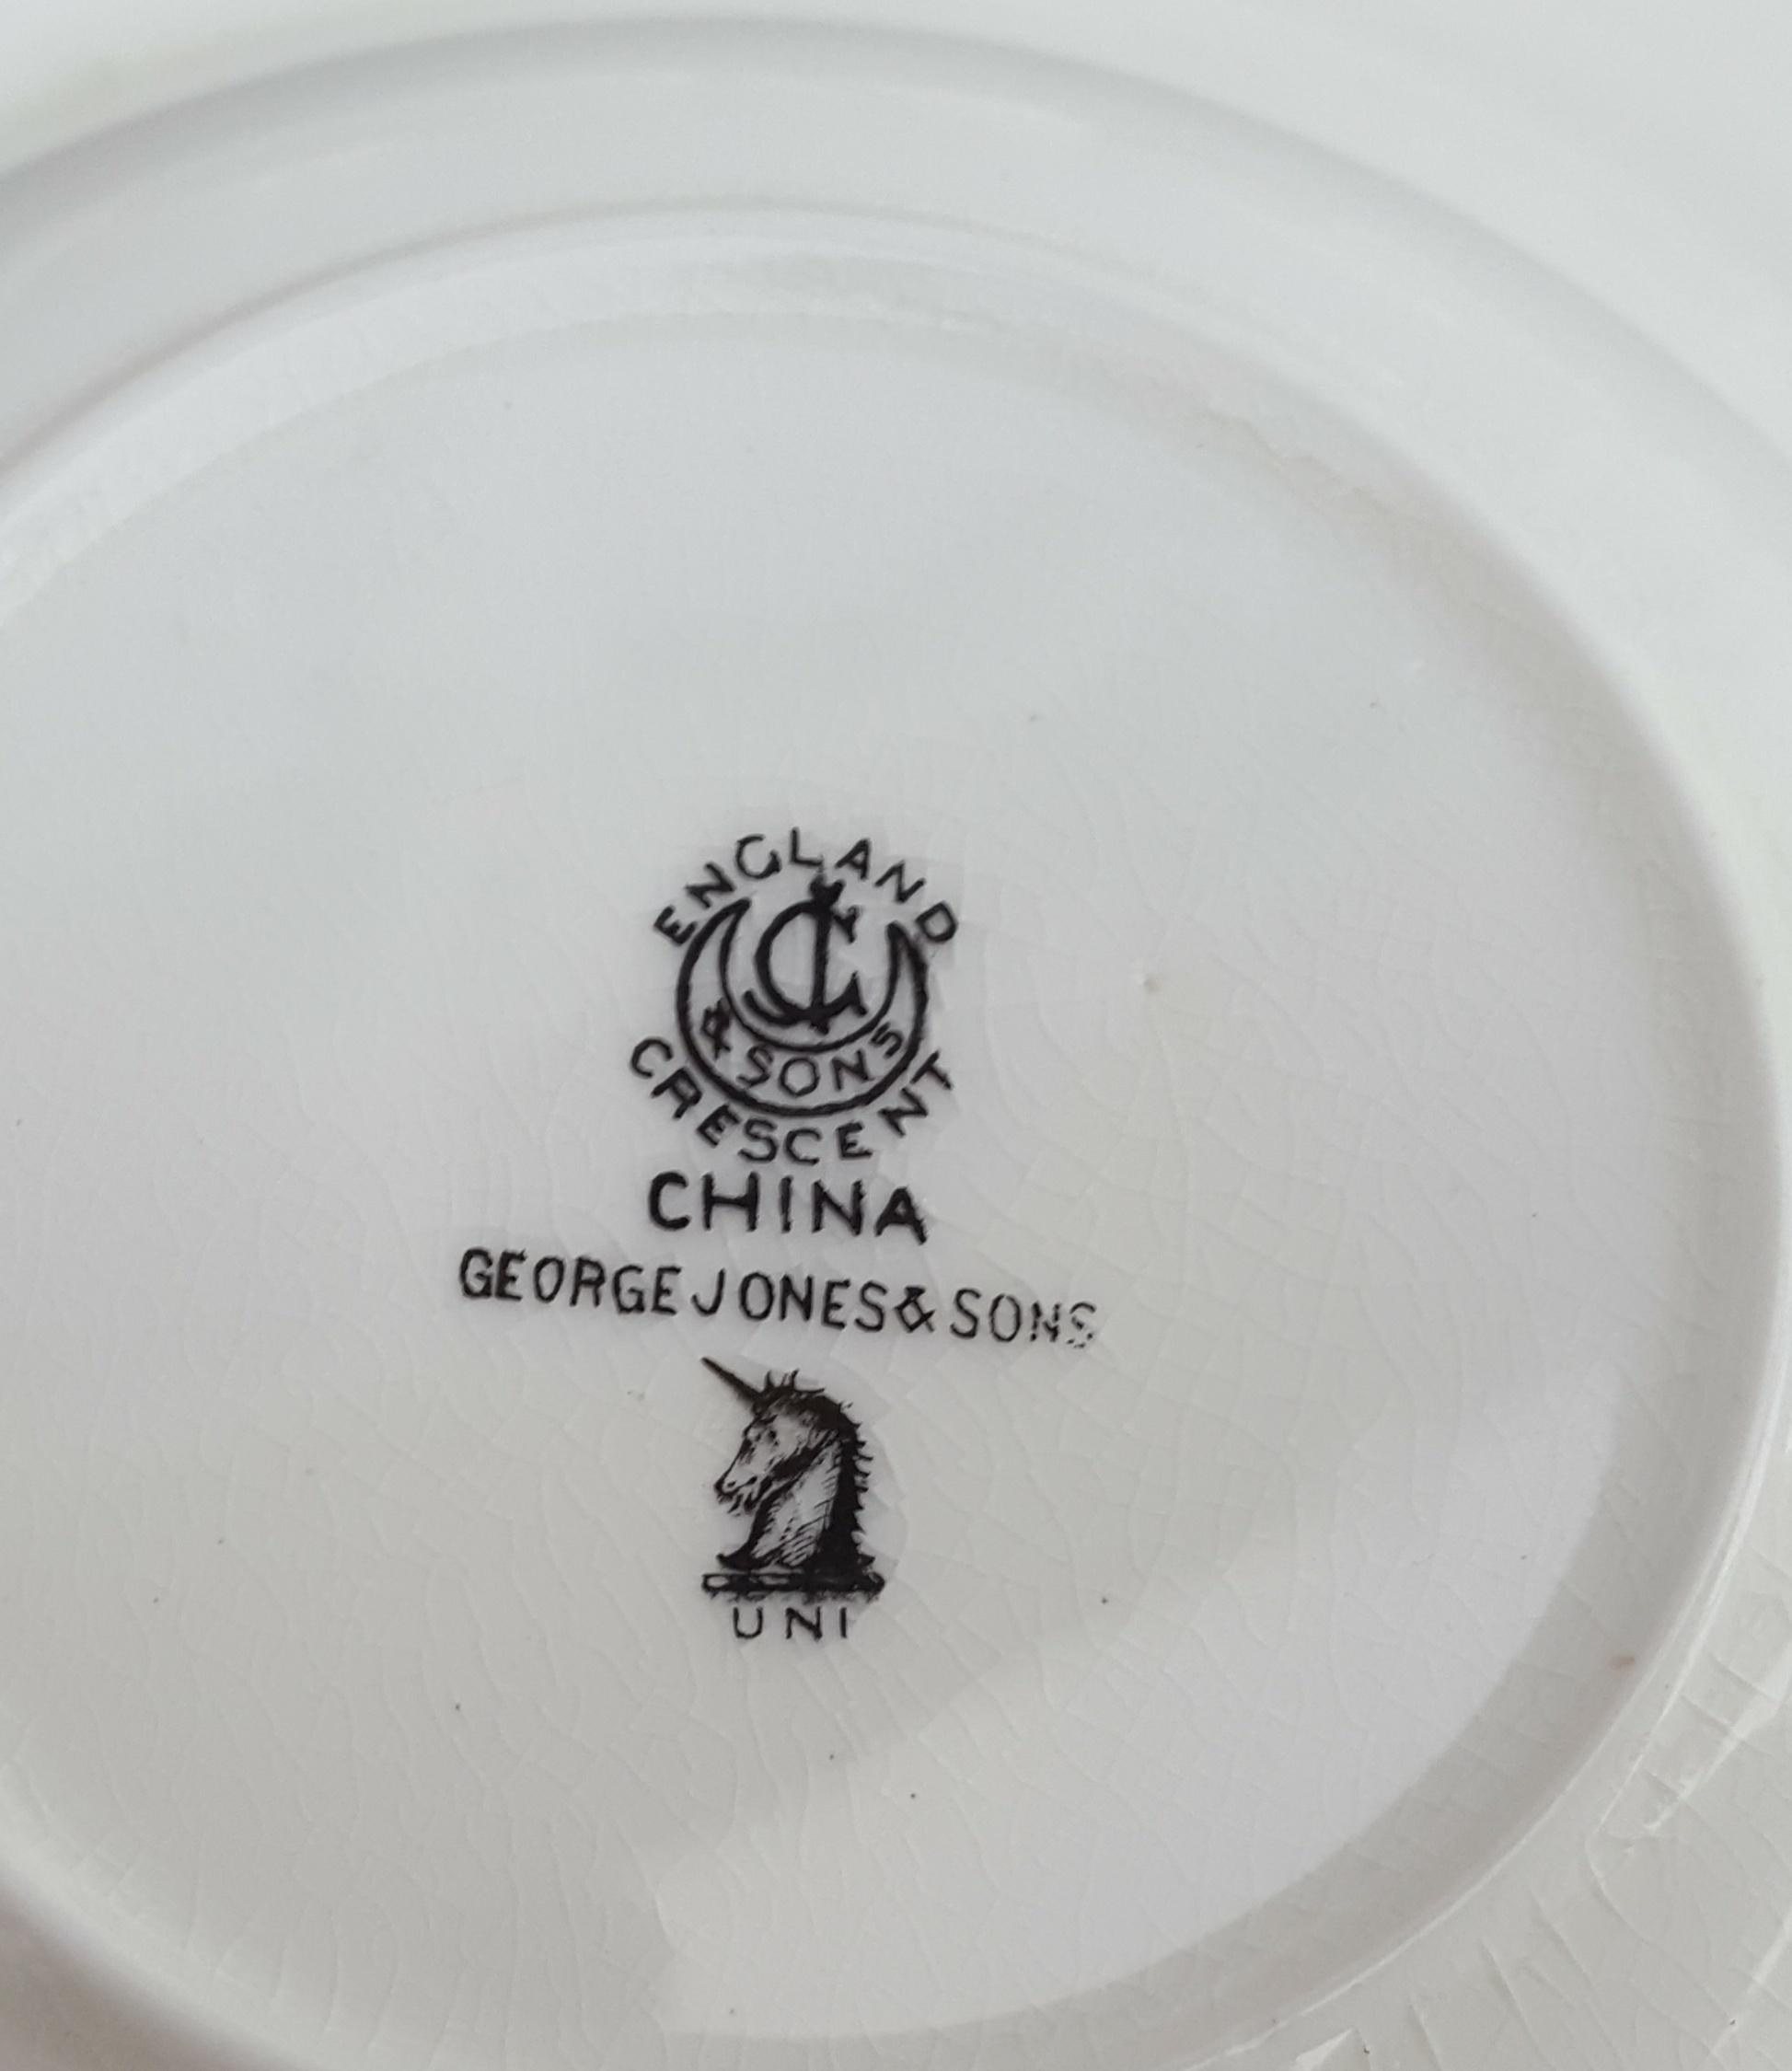 Lot 118 - Antique Vintage Collectable George Jones 10 Piece Coffee Set